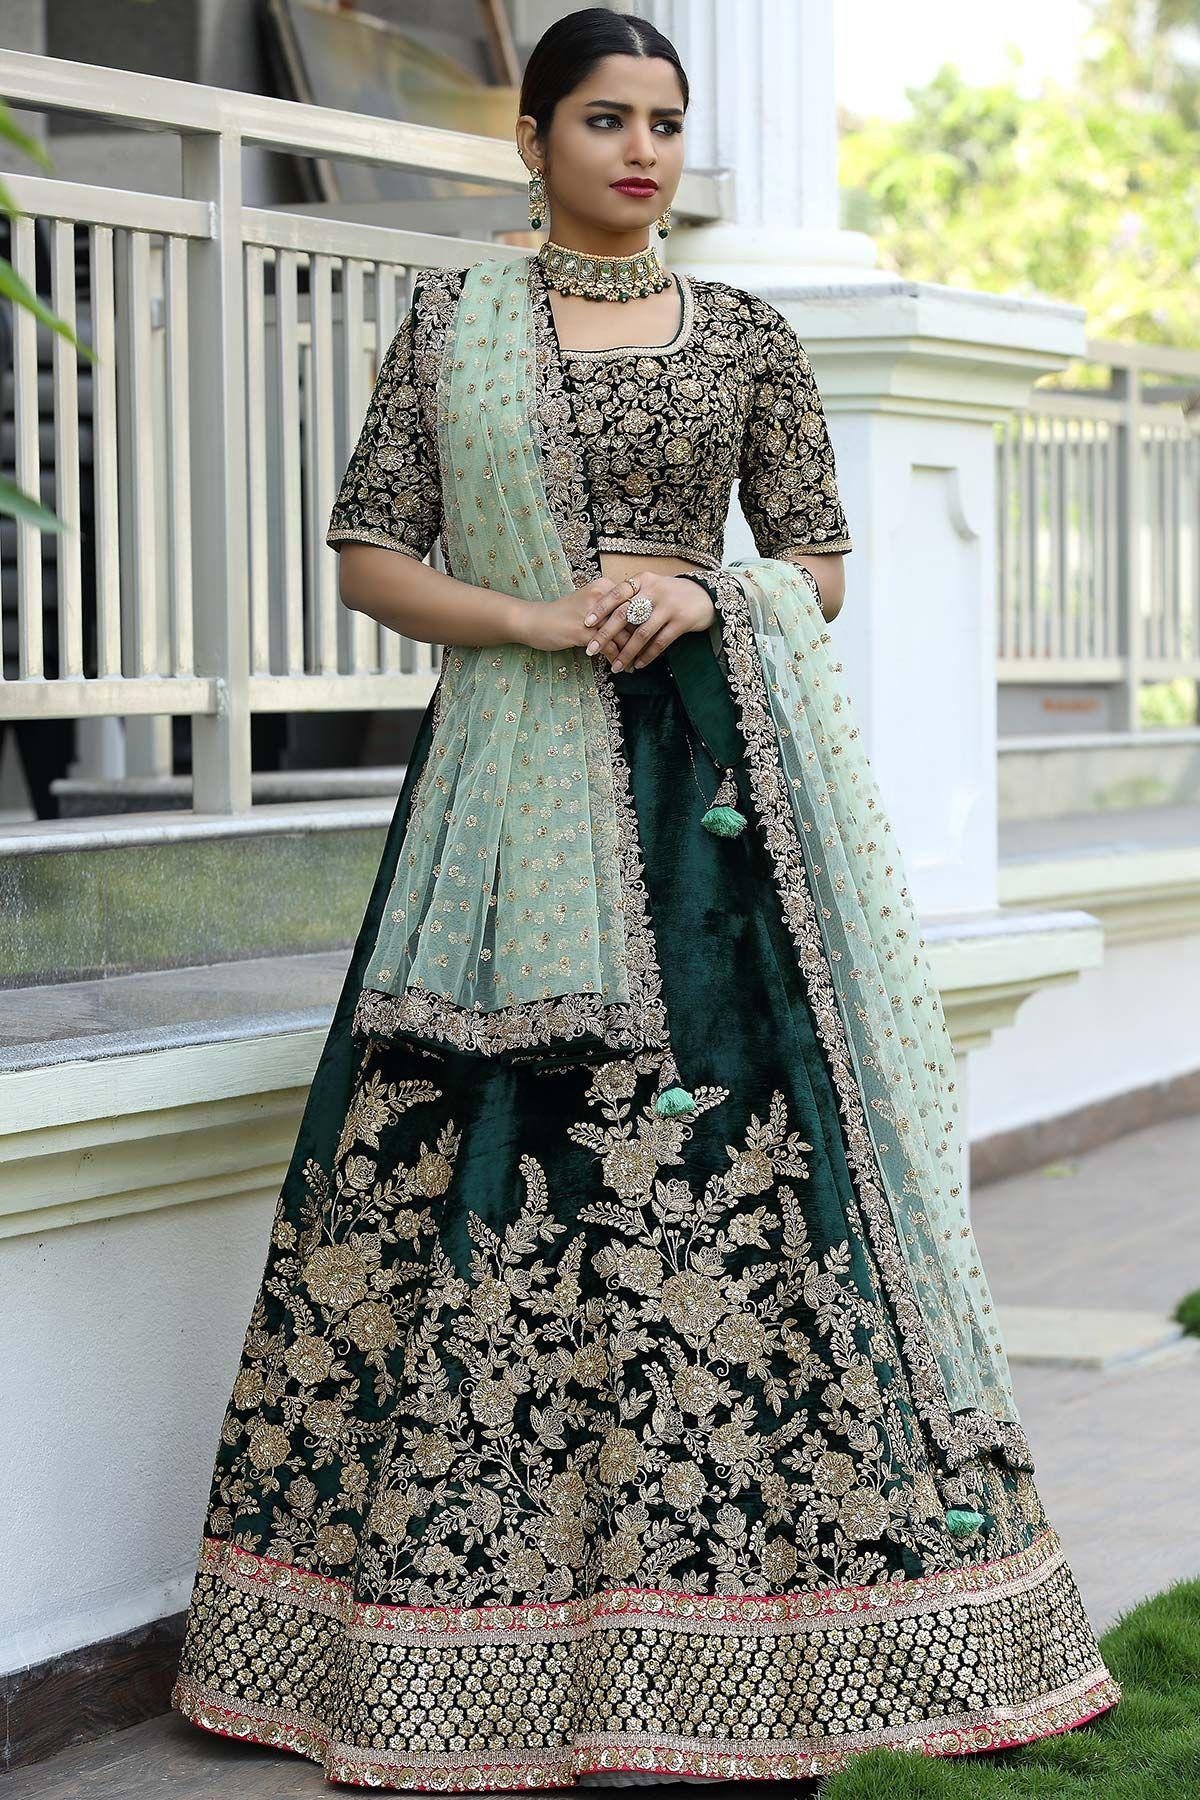 Buy Emerald Green Velvet Zari Embroidered Bridal Lehenga Online | Indian  bridal dress, Bridal lehenga, Bridal lehenga online